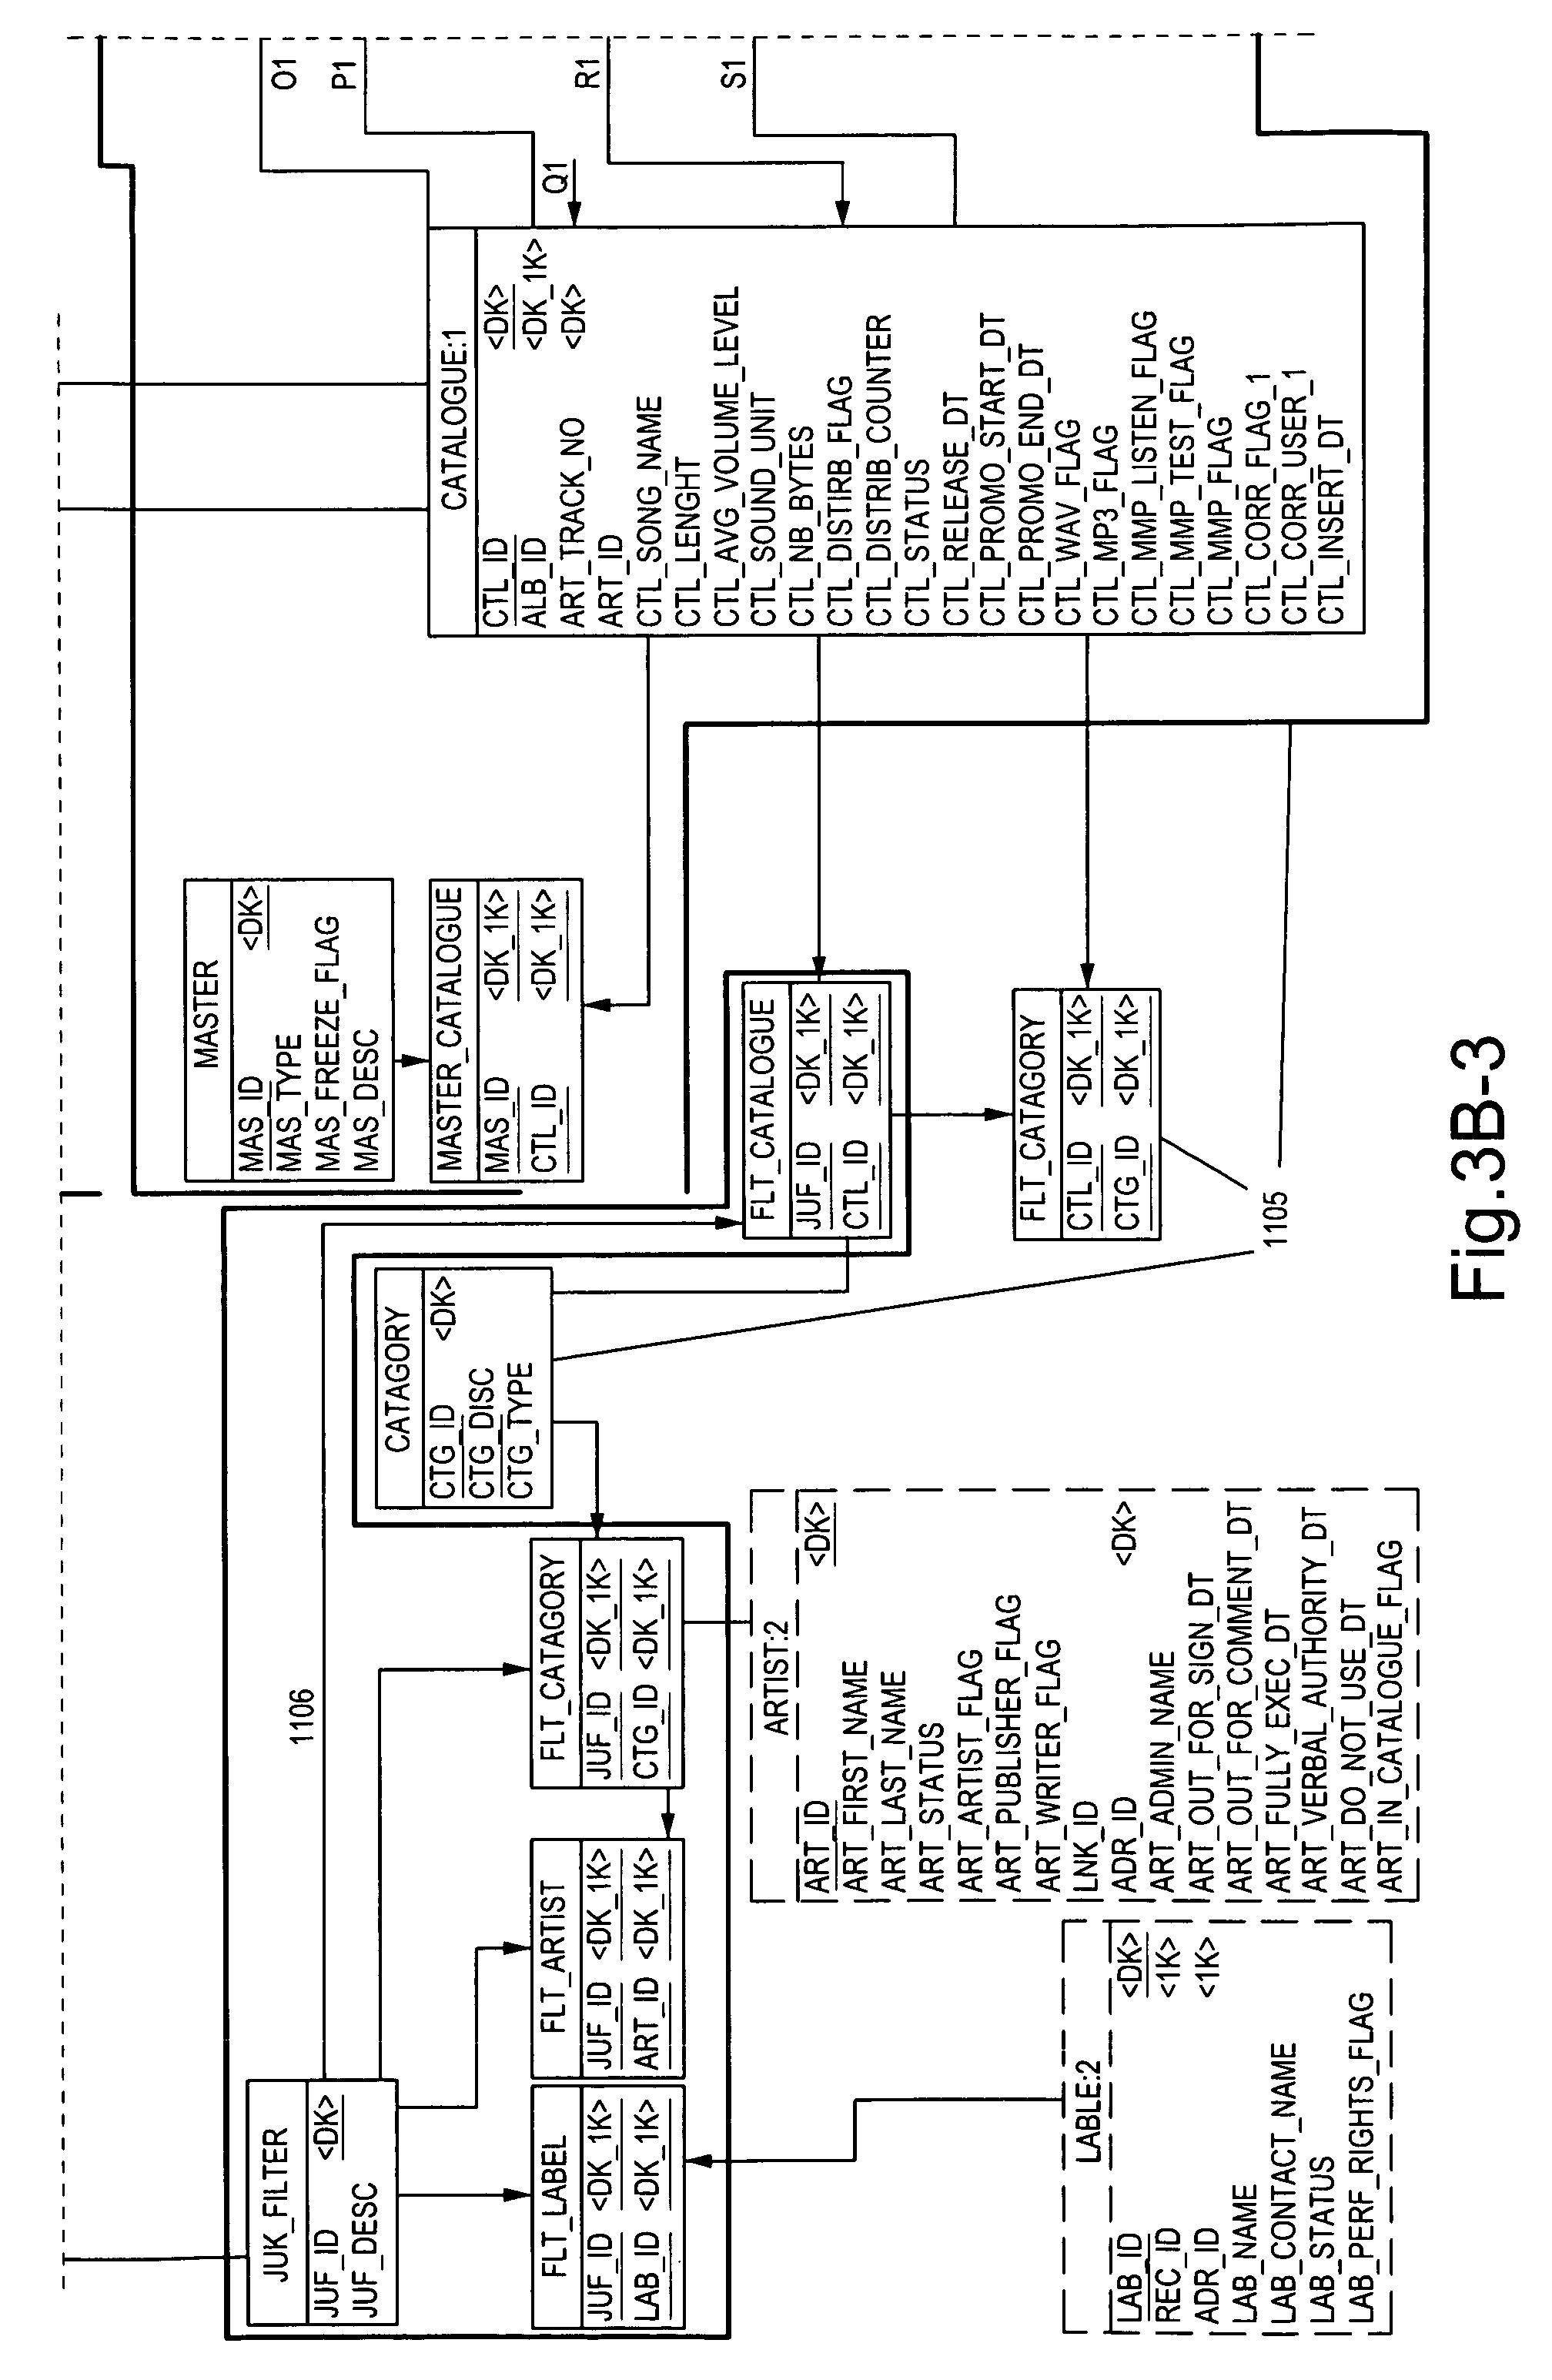 Patent US 7,996,438 B2